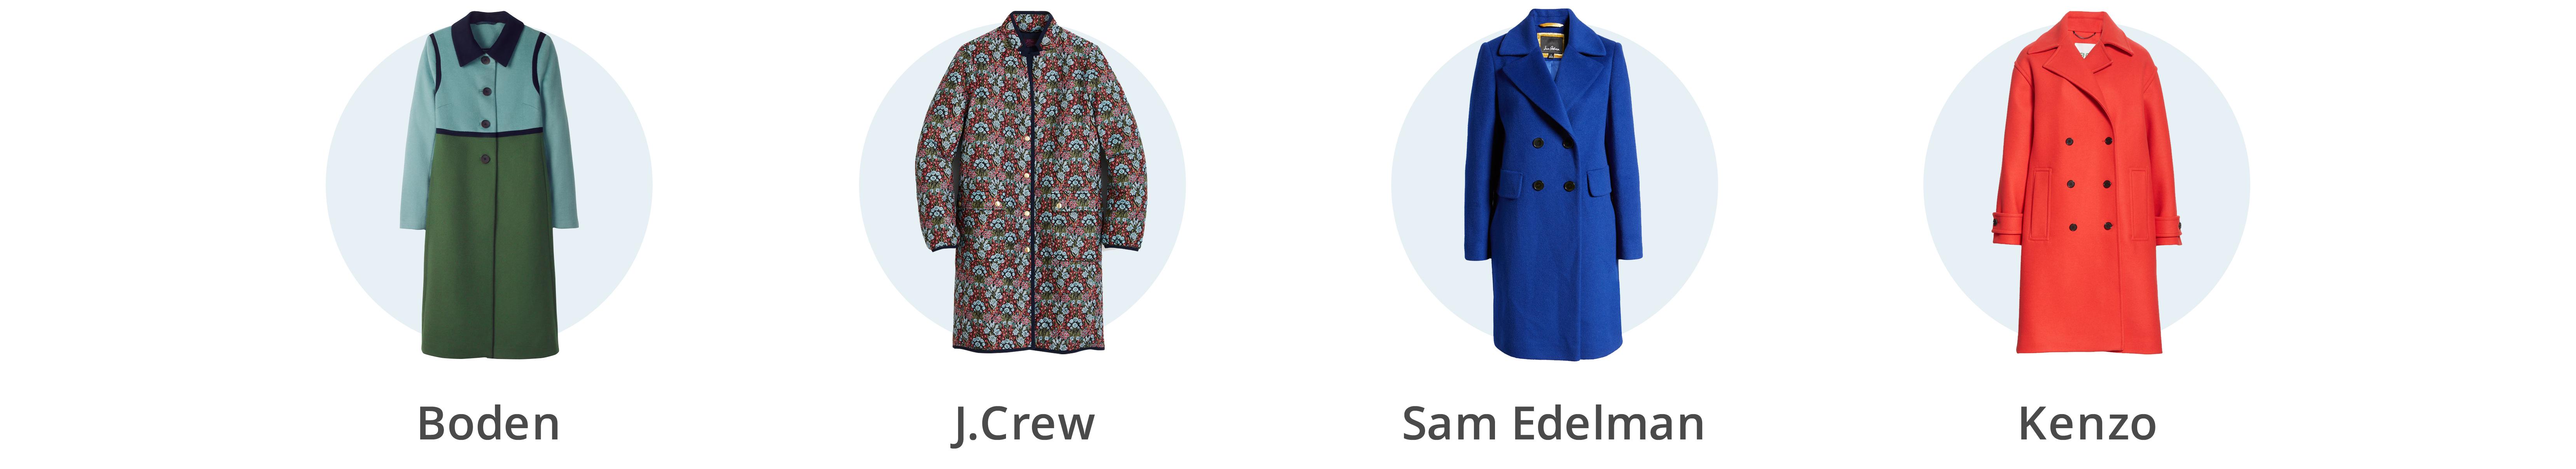 Women's colorful winter coats